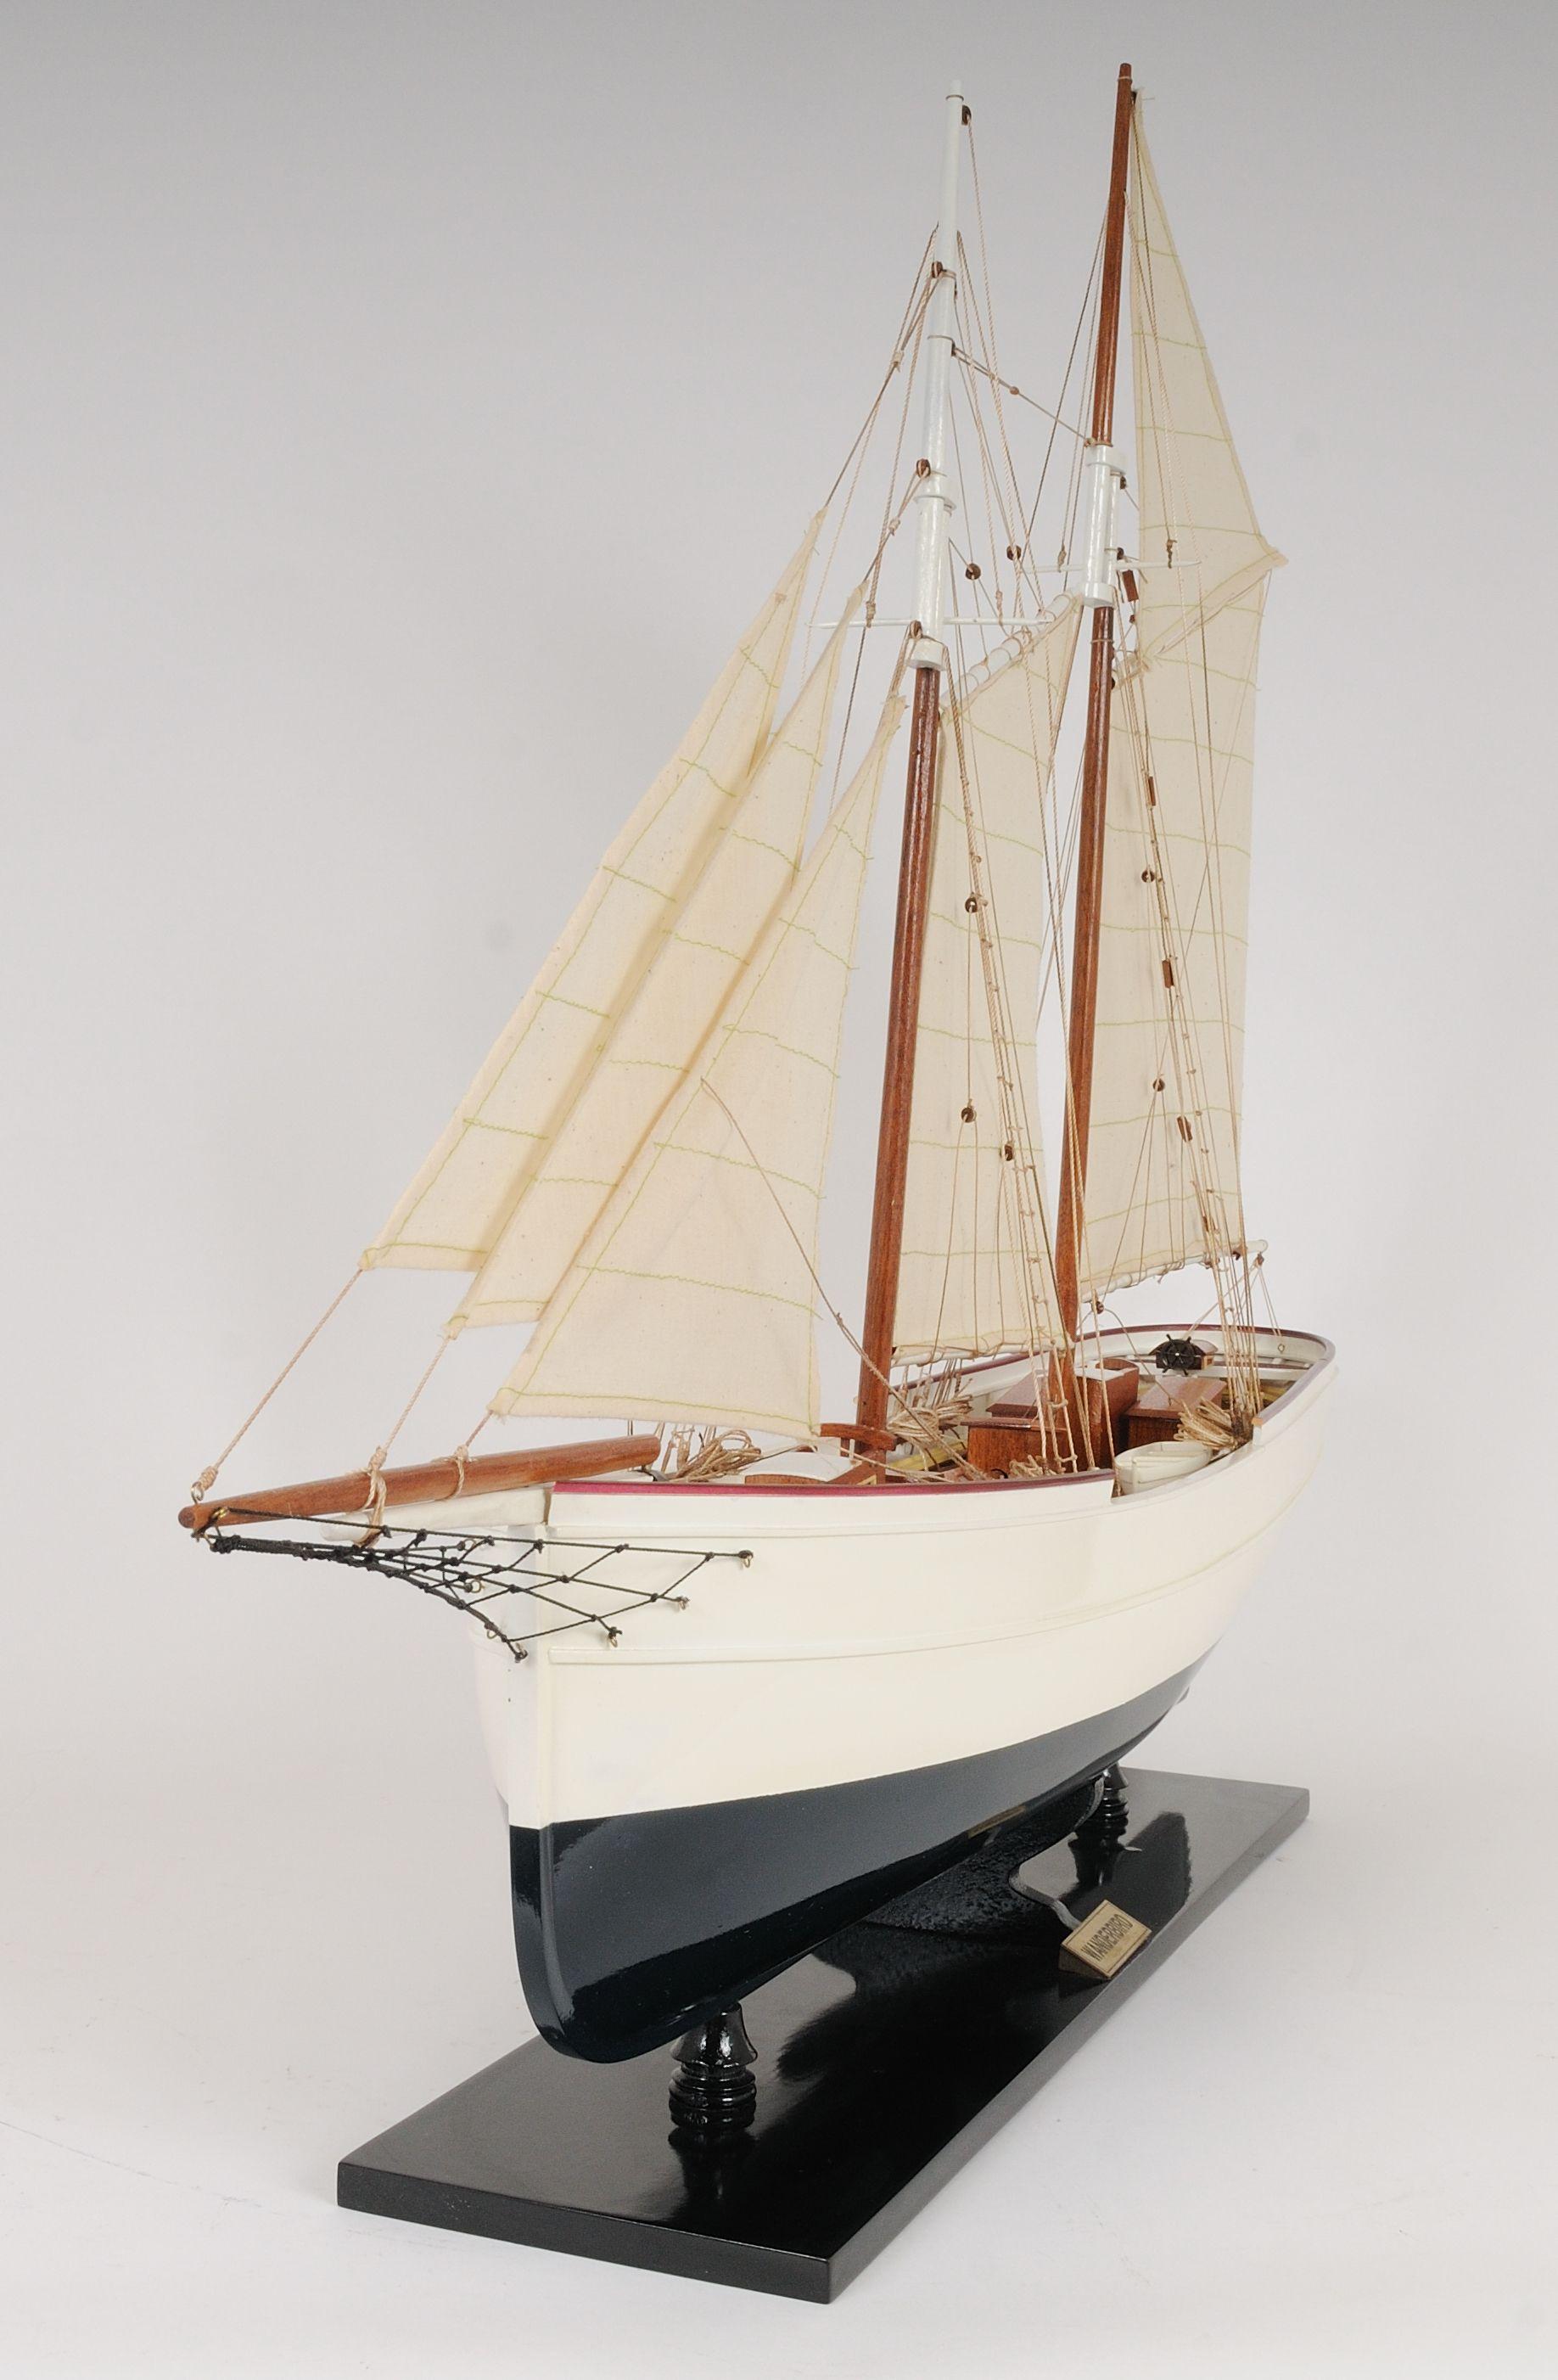 2245-13200-Wanderbird-Wooden-Model-Ship